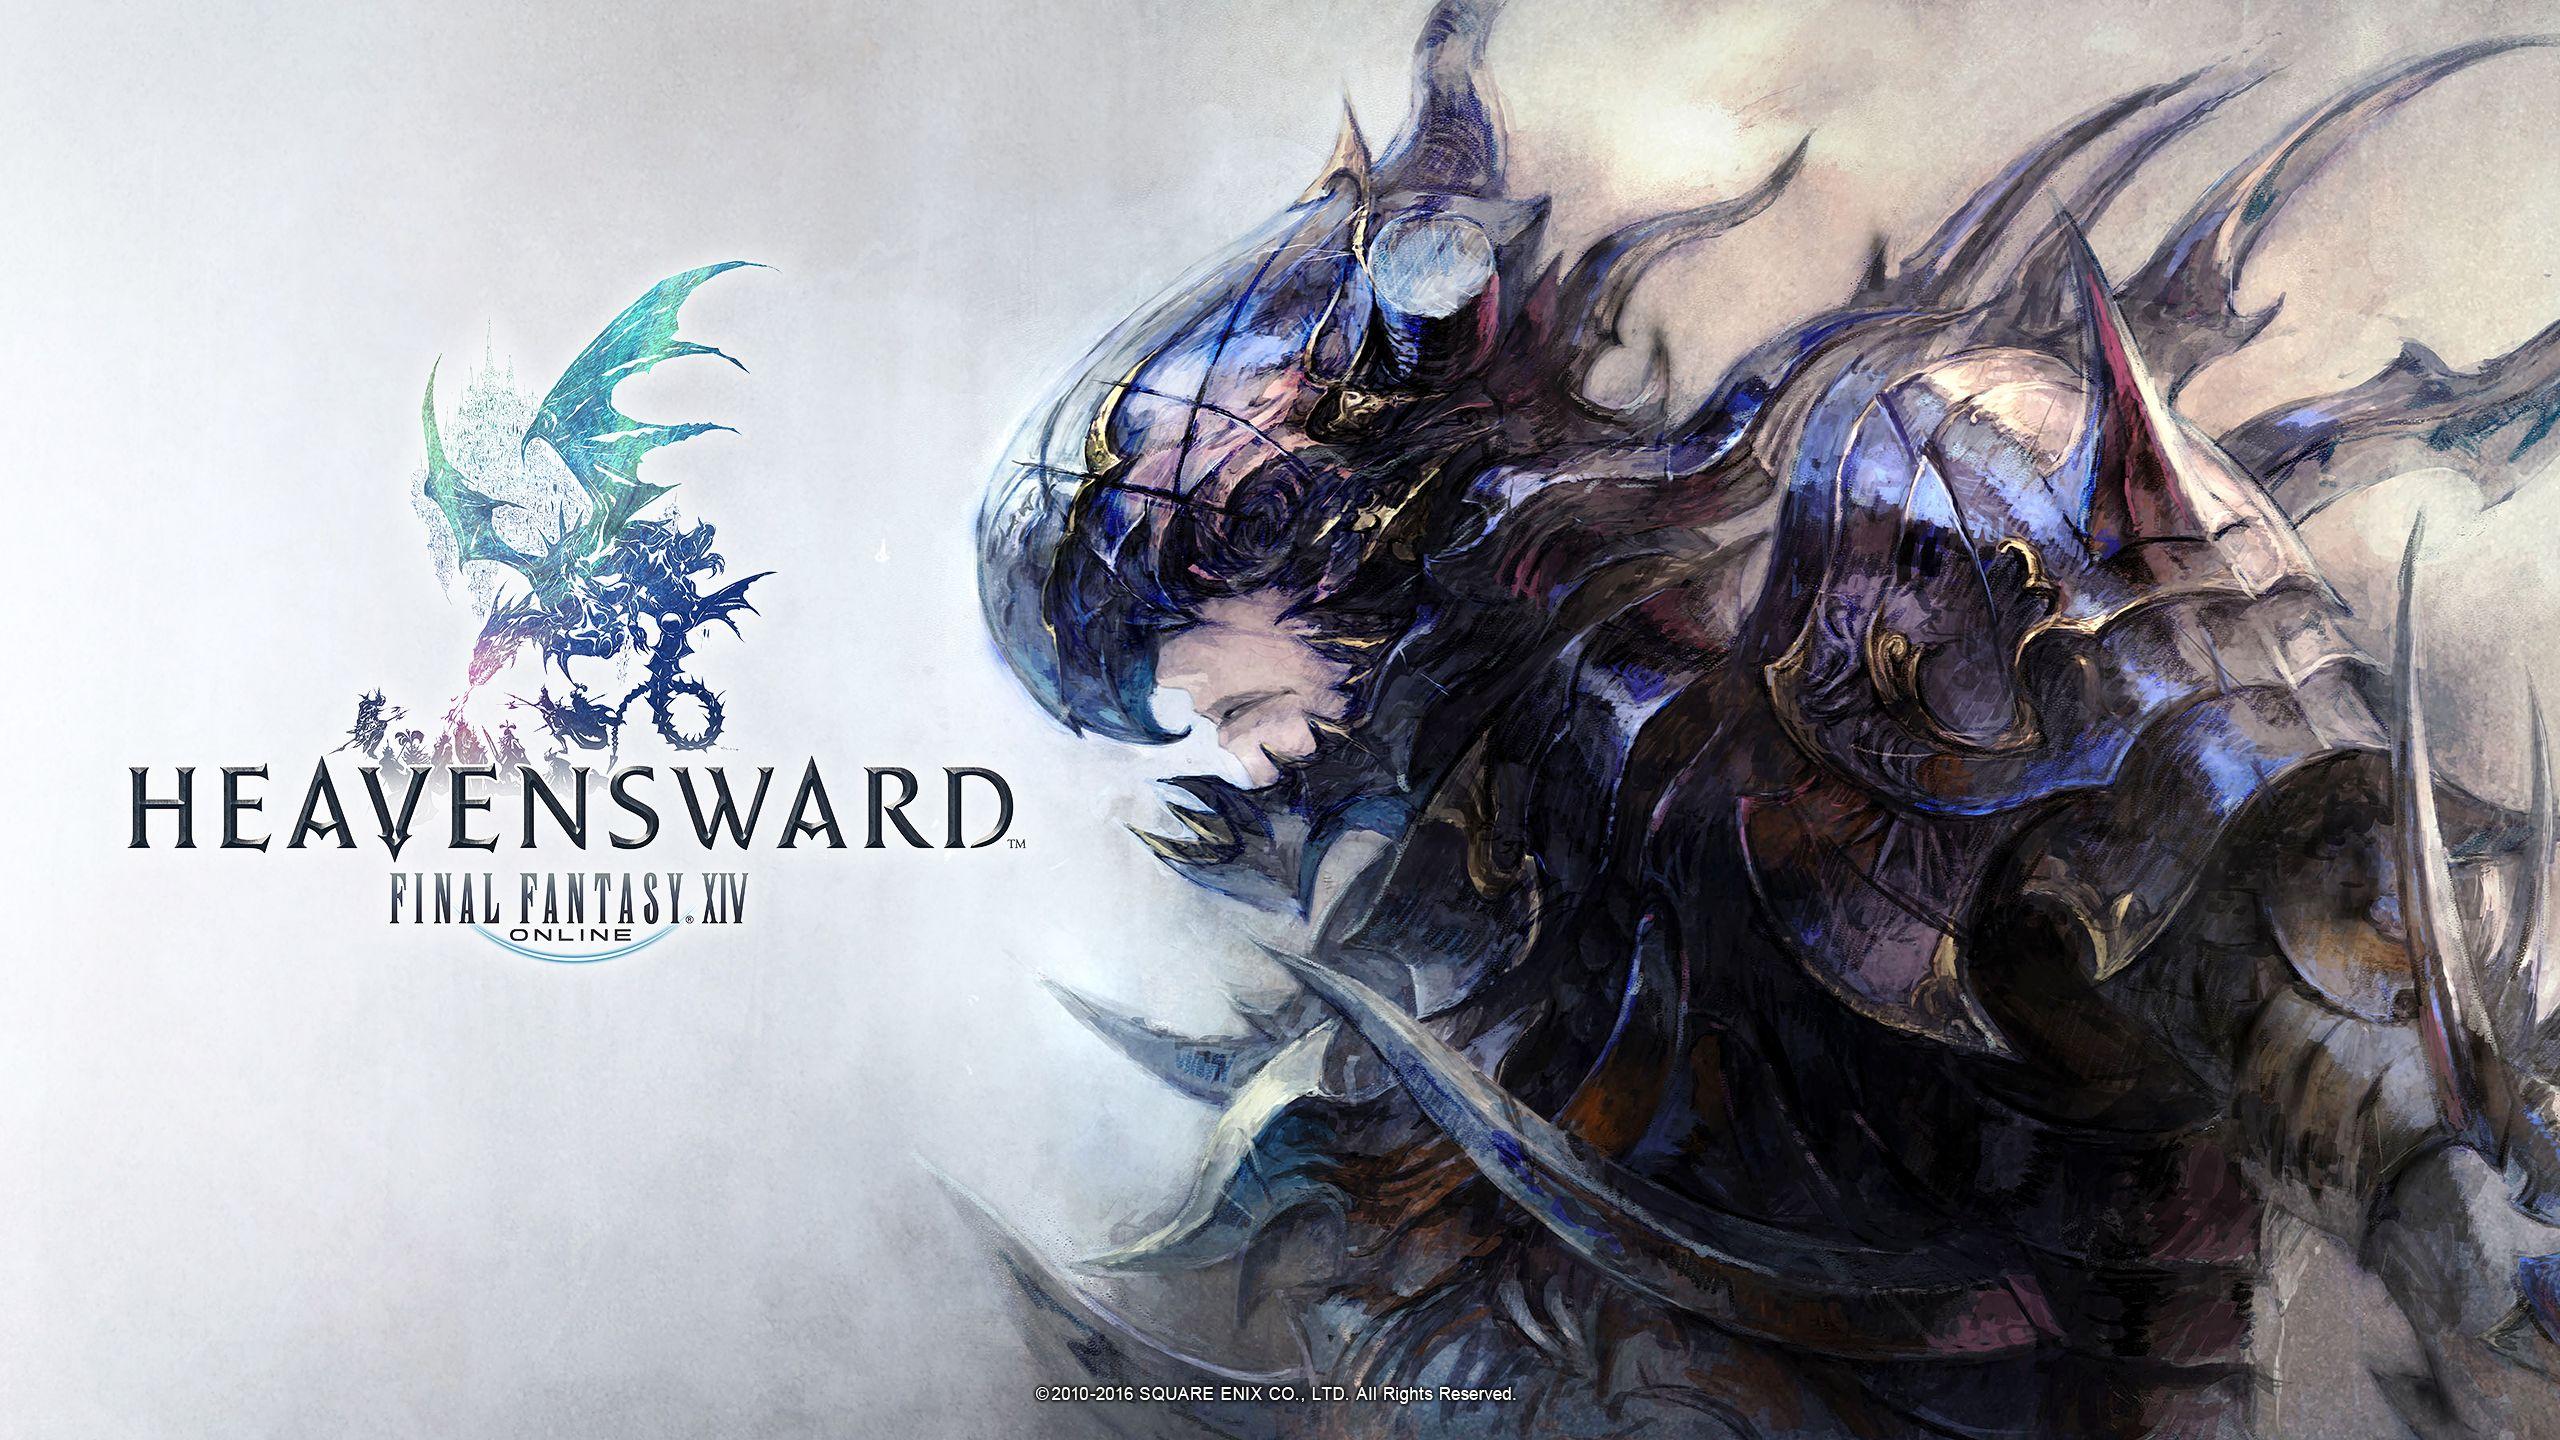 Final Fantasy XIV Free Trial expanded to Heavensward